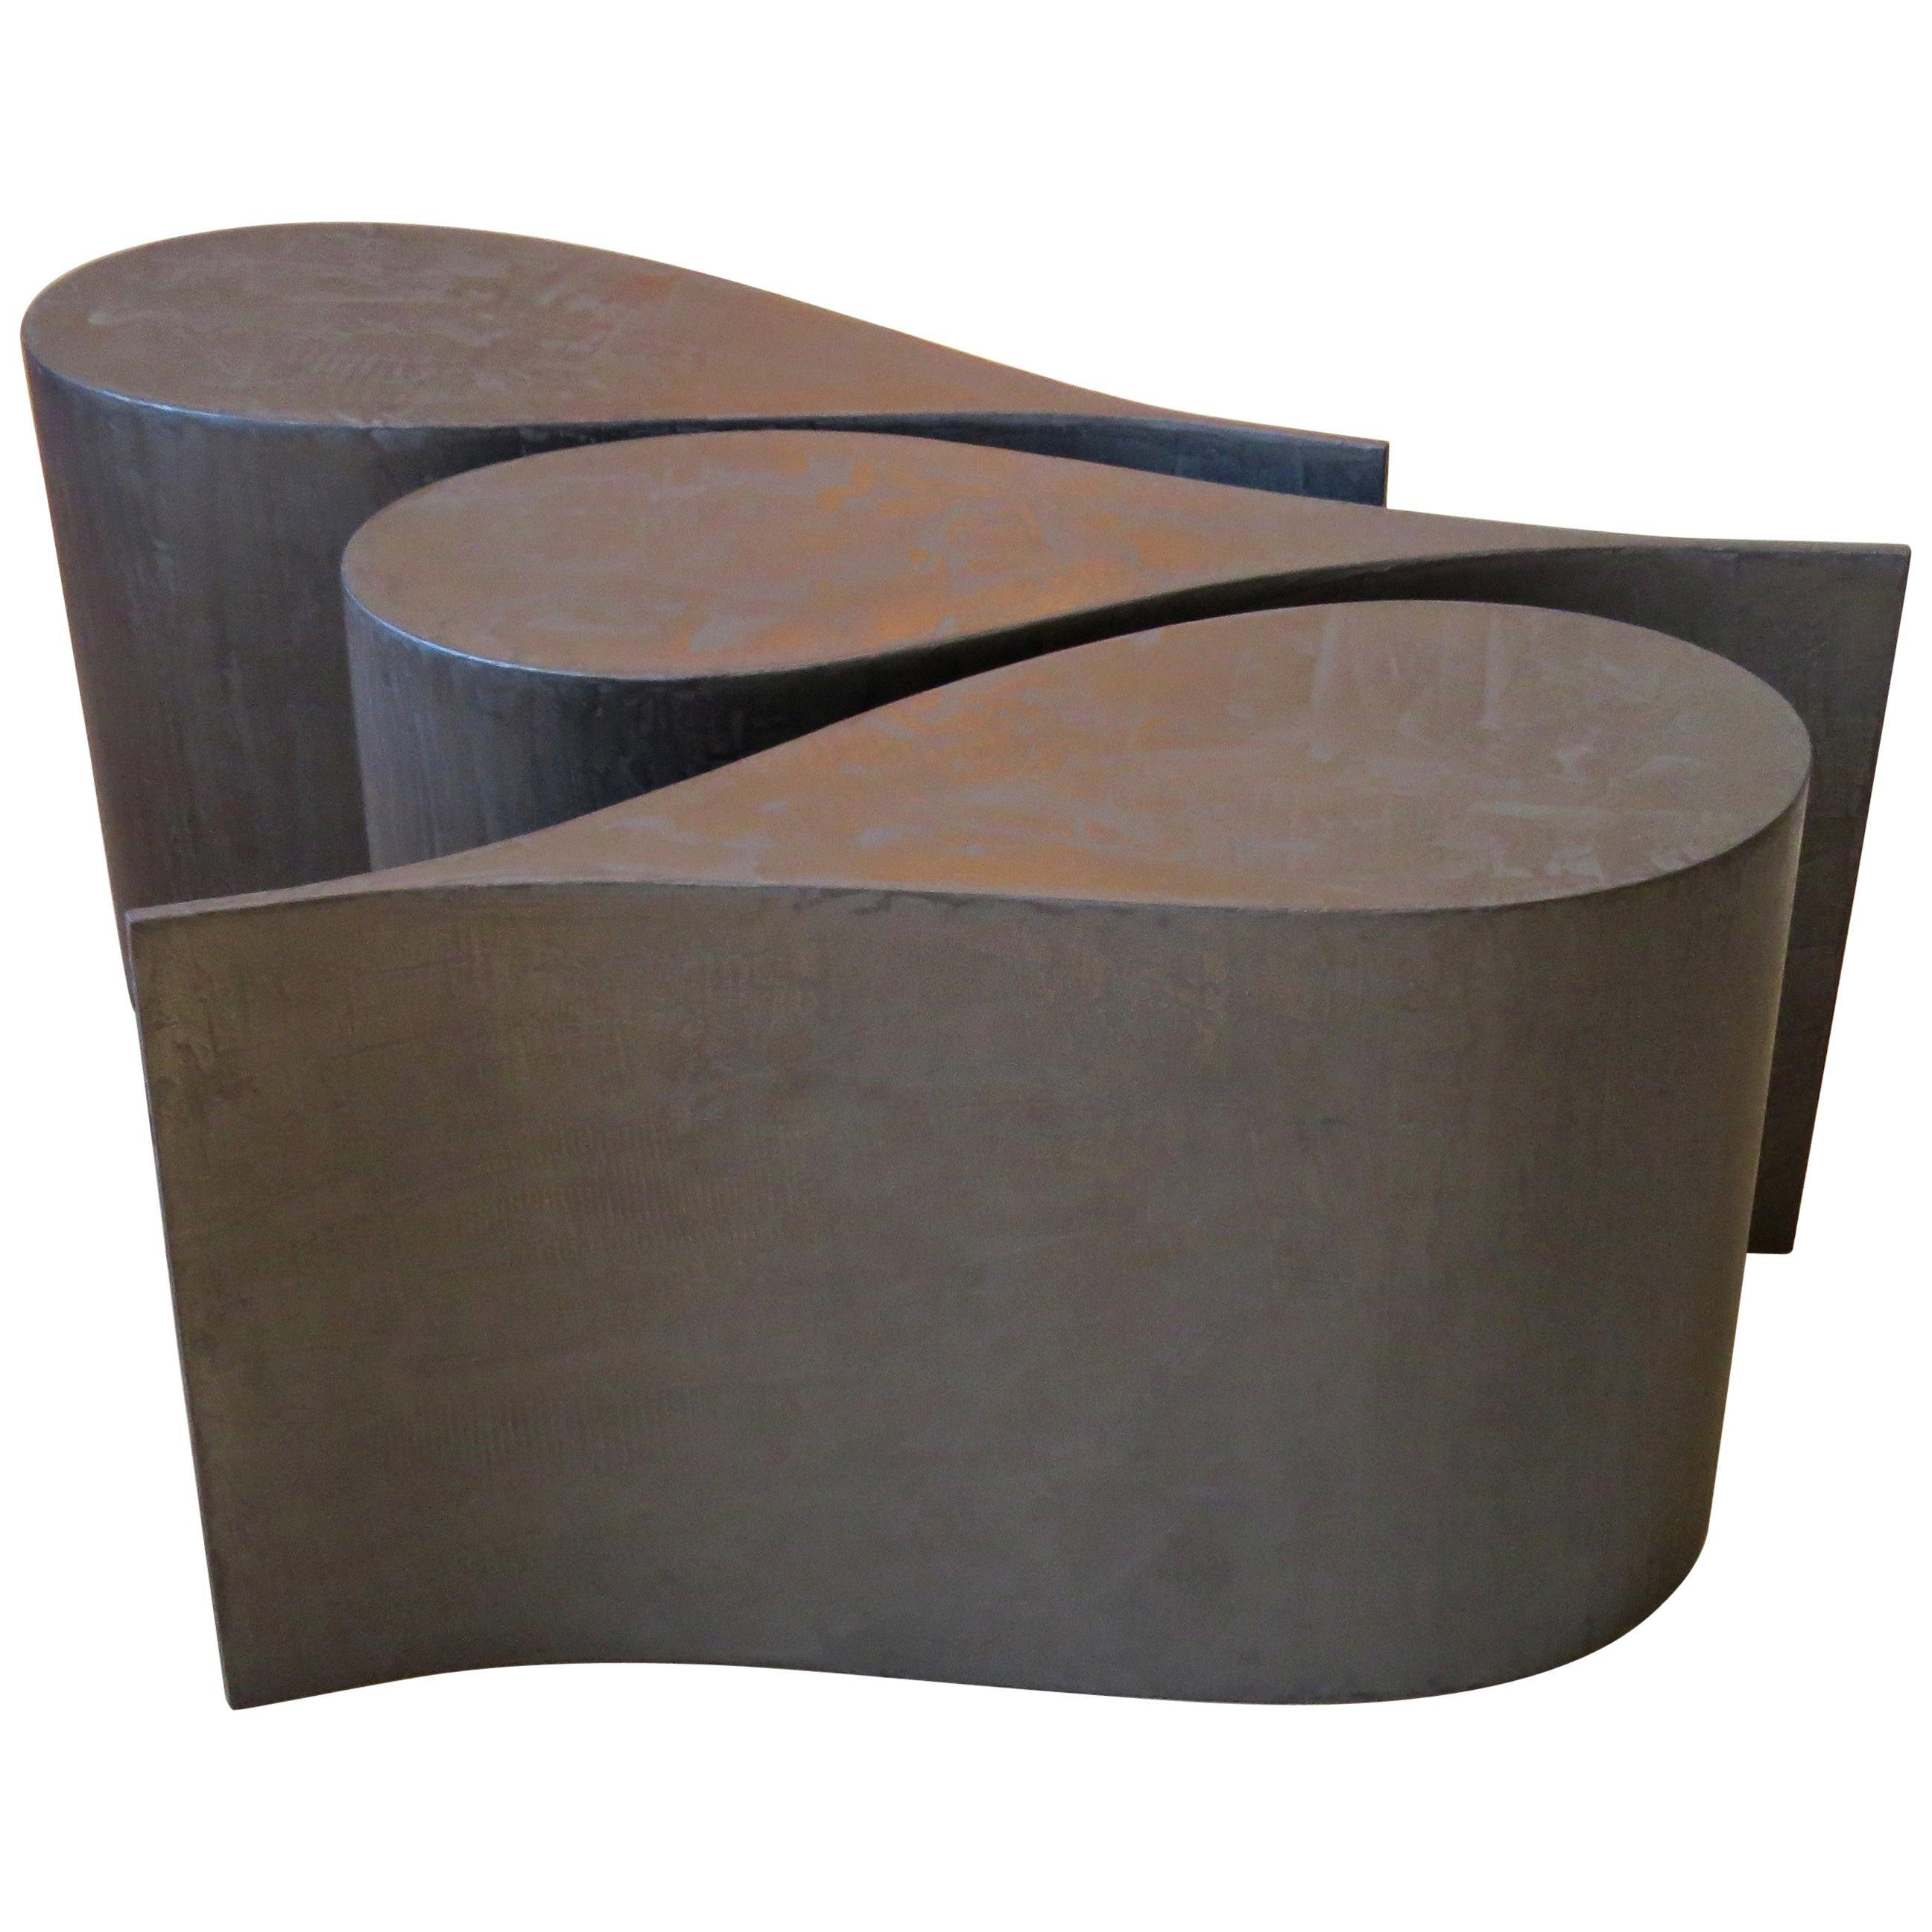 Industrial, European, 21st Century, Coffee Table, Coated Titanium